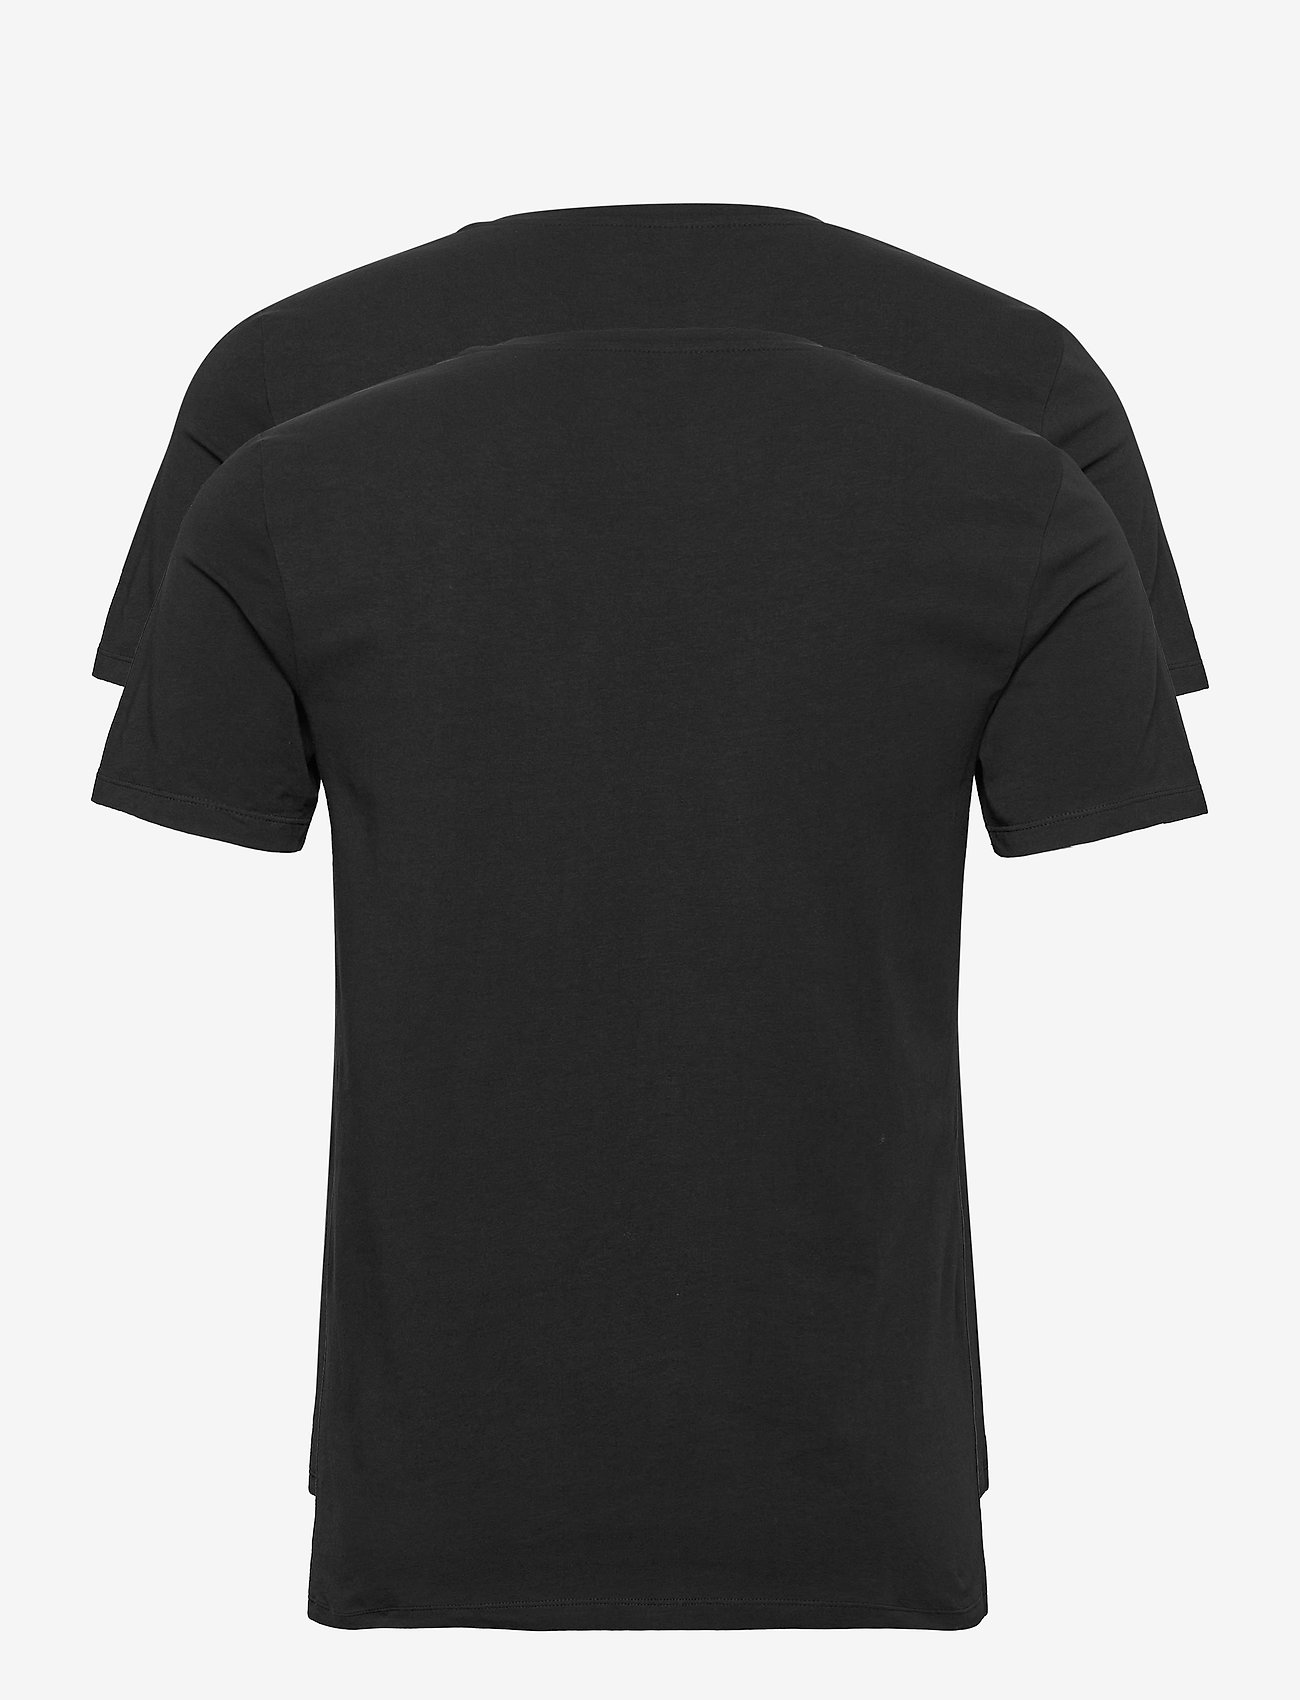 Björn Borg - TEE THOMAS SOLID - basic t-shirts - black beauty - 1